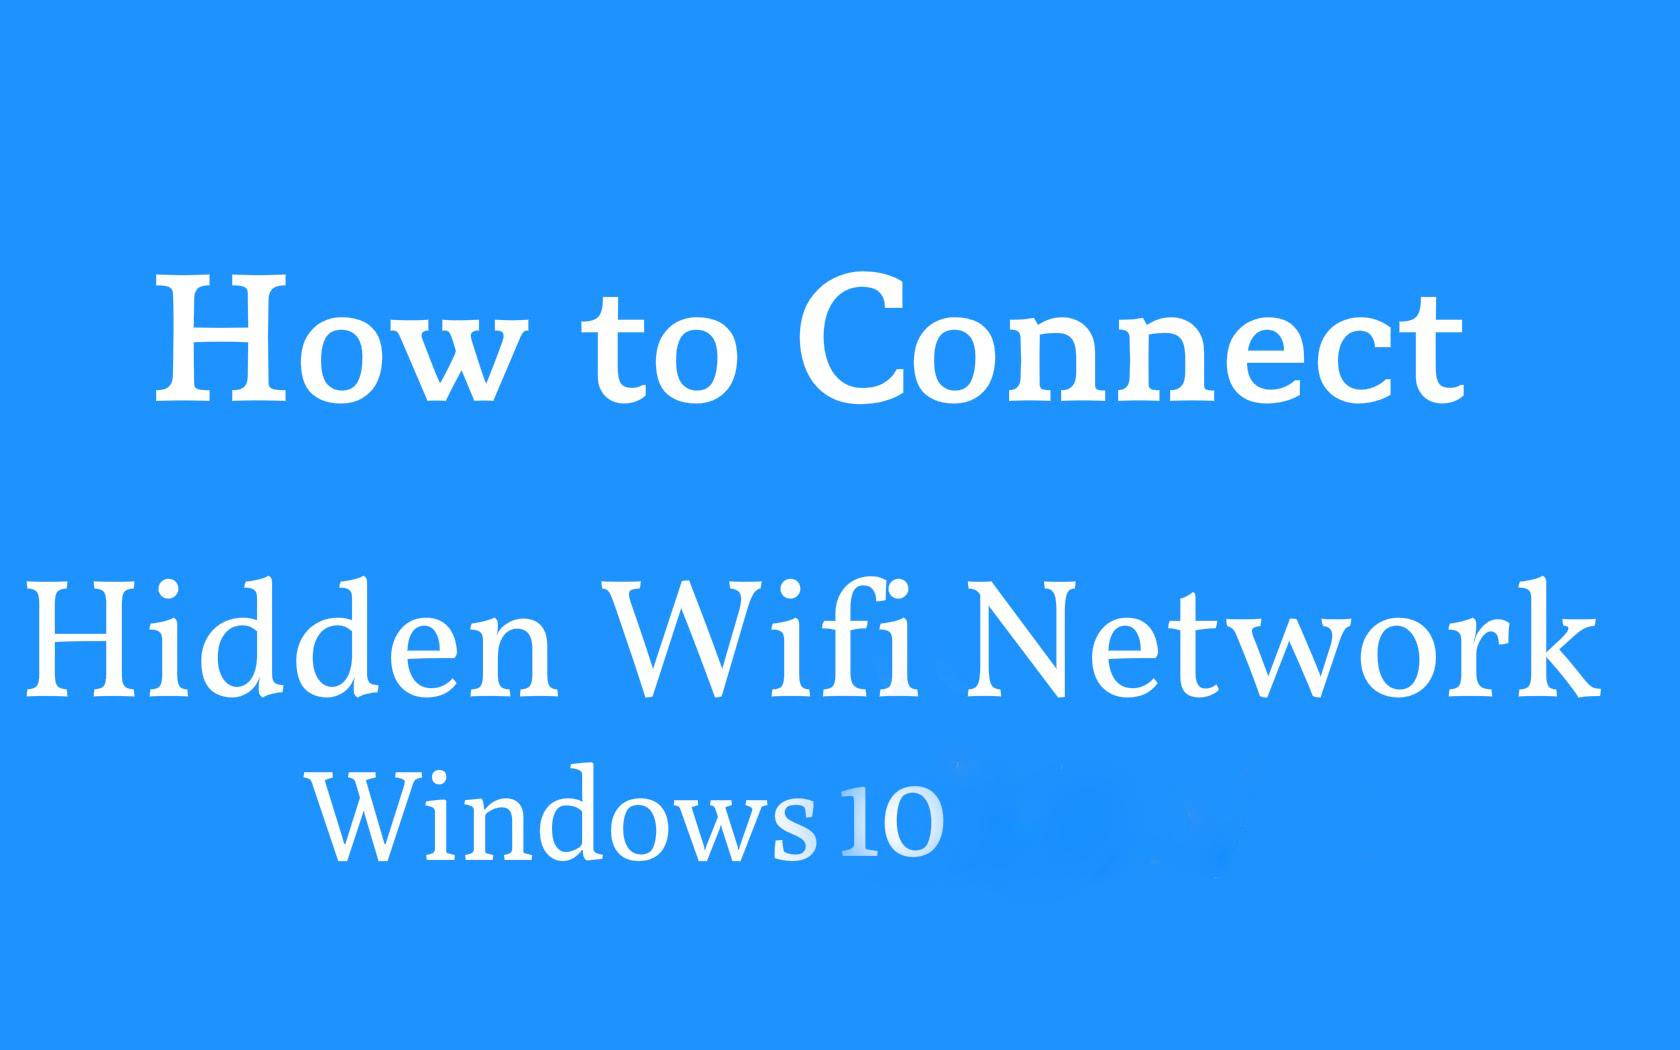 add hidden wifi network windows 10